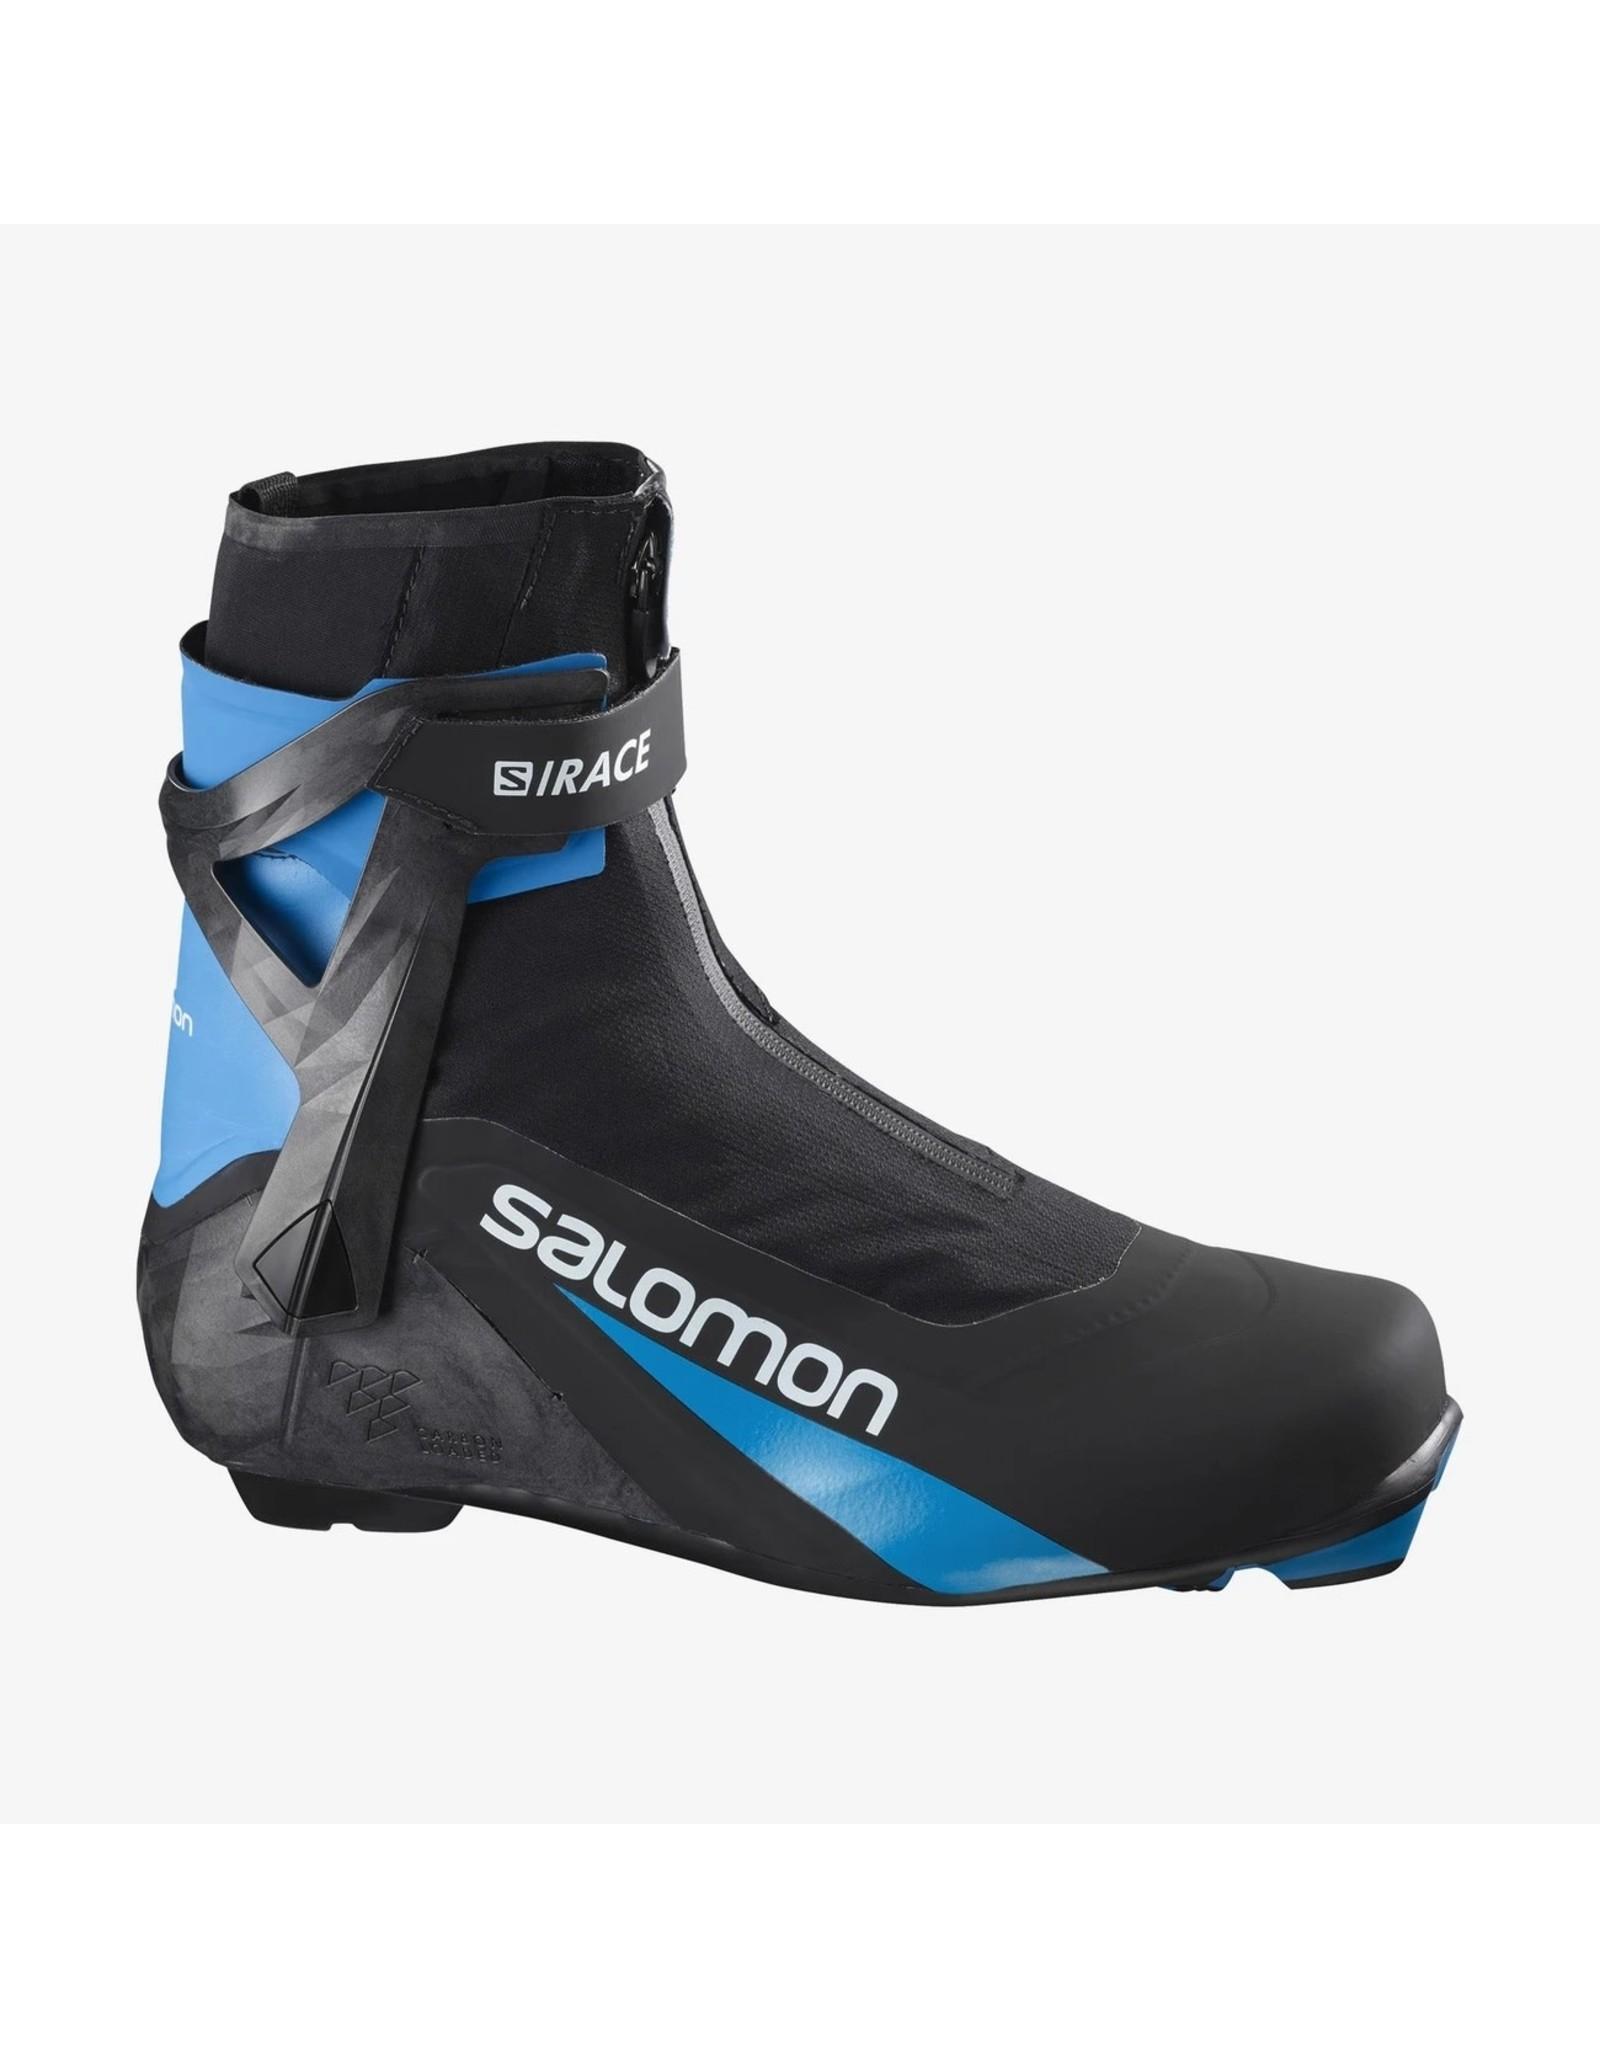 SALOMON '22, SALOMON, S/Race Carbon Skate Prolink